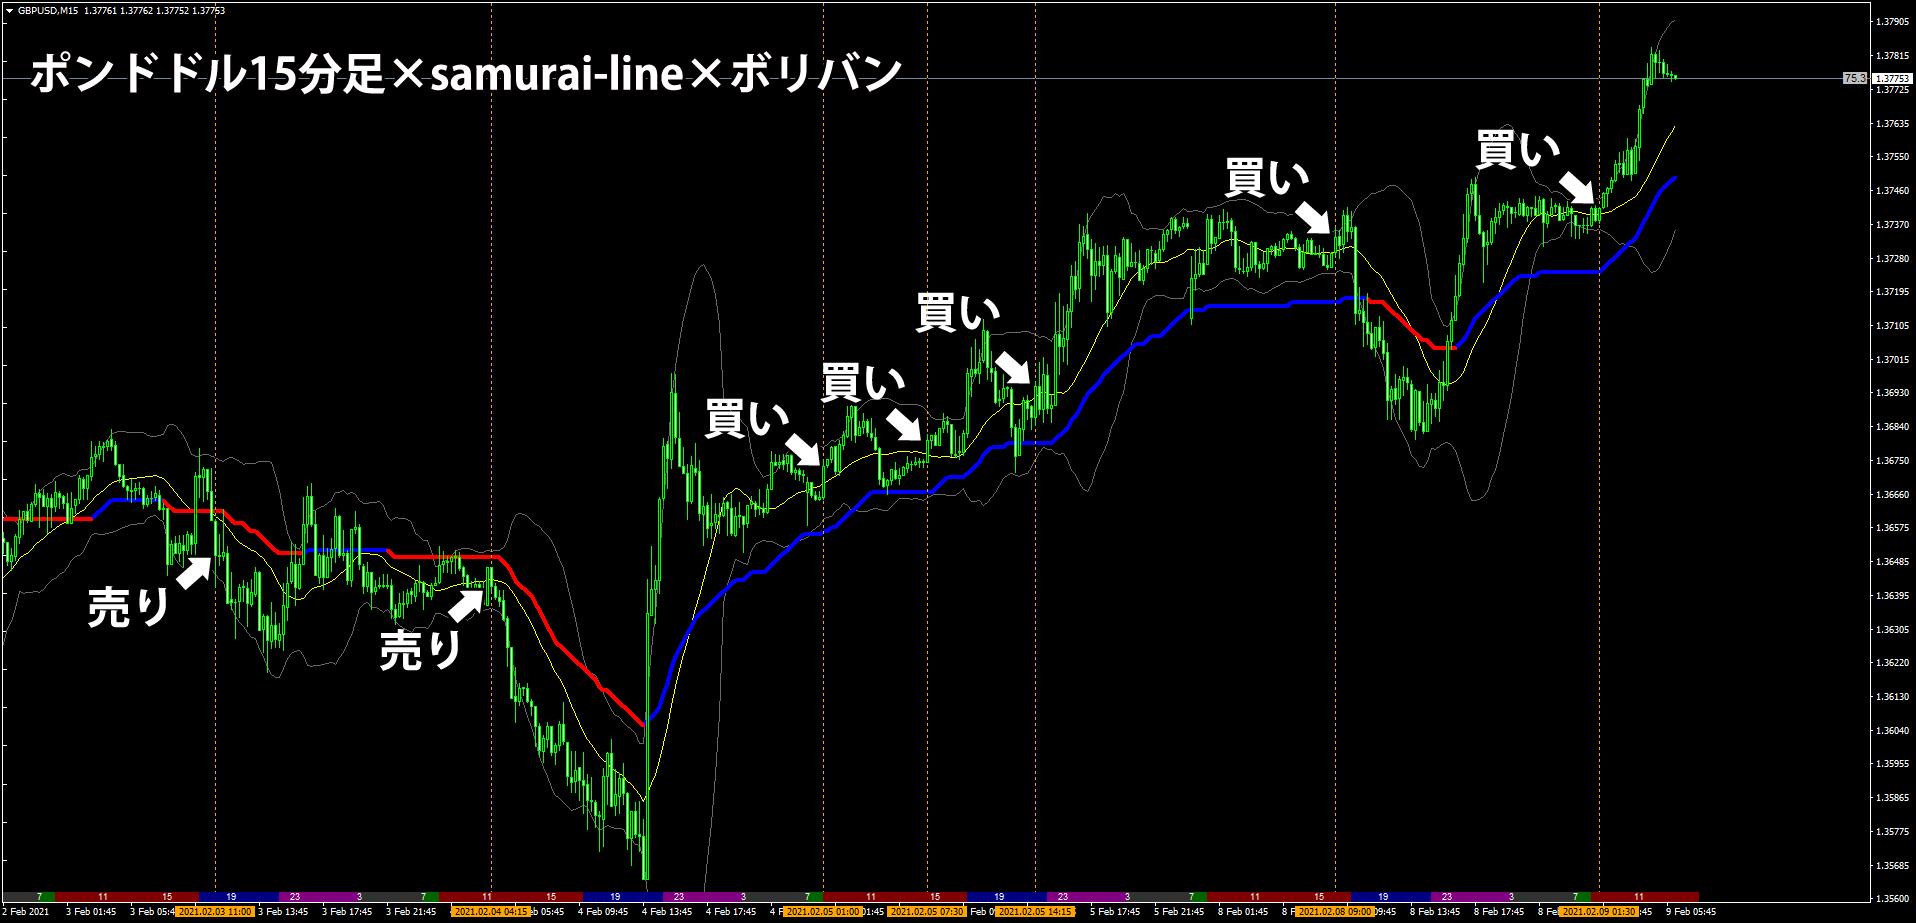 samurai-lineでのトレンド判断+ボリバンを使ったトレード事例